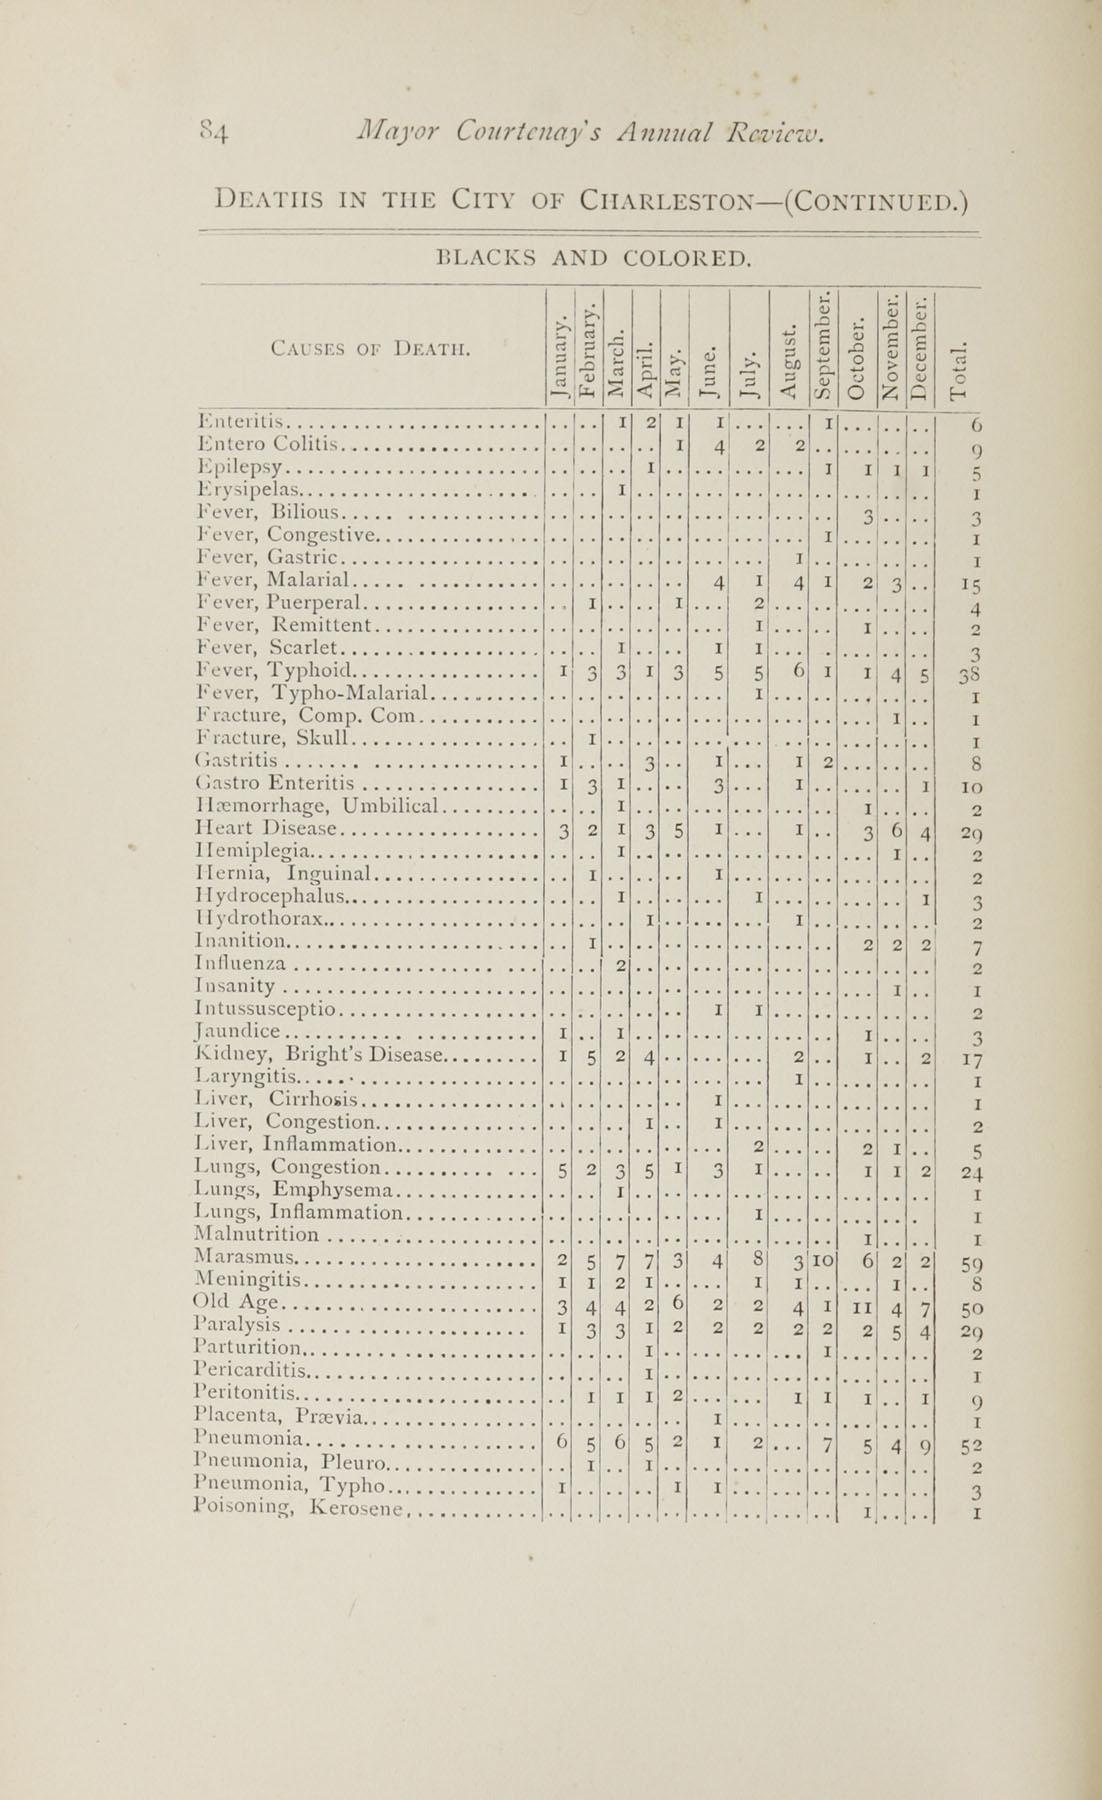 Charleston Yearbook, 1882, page 84